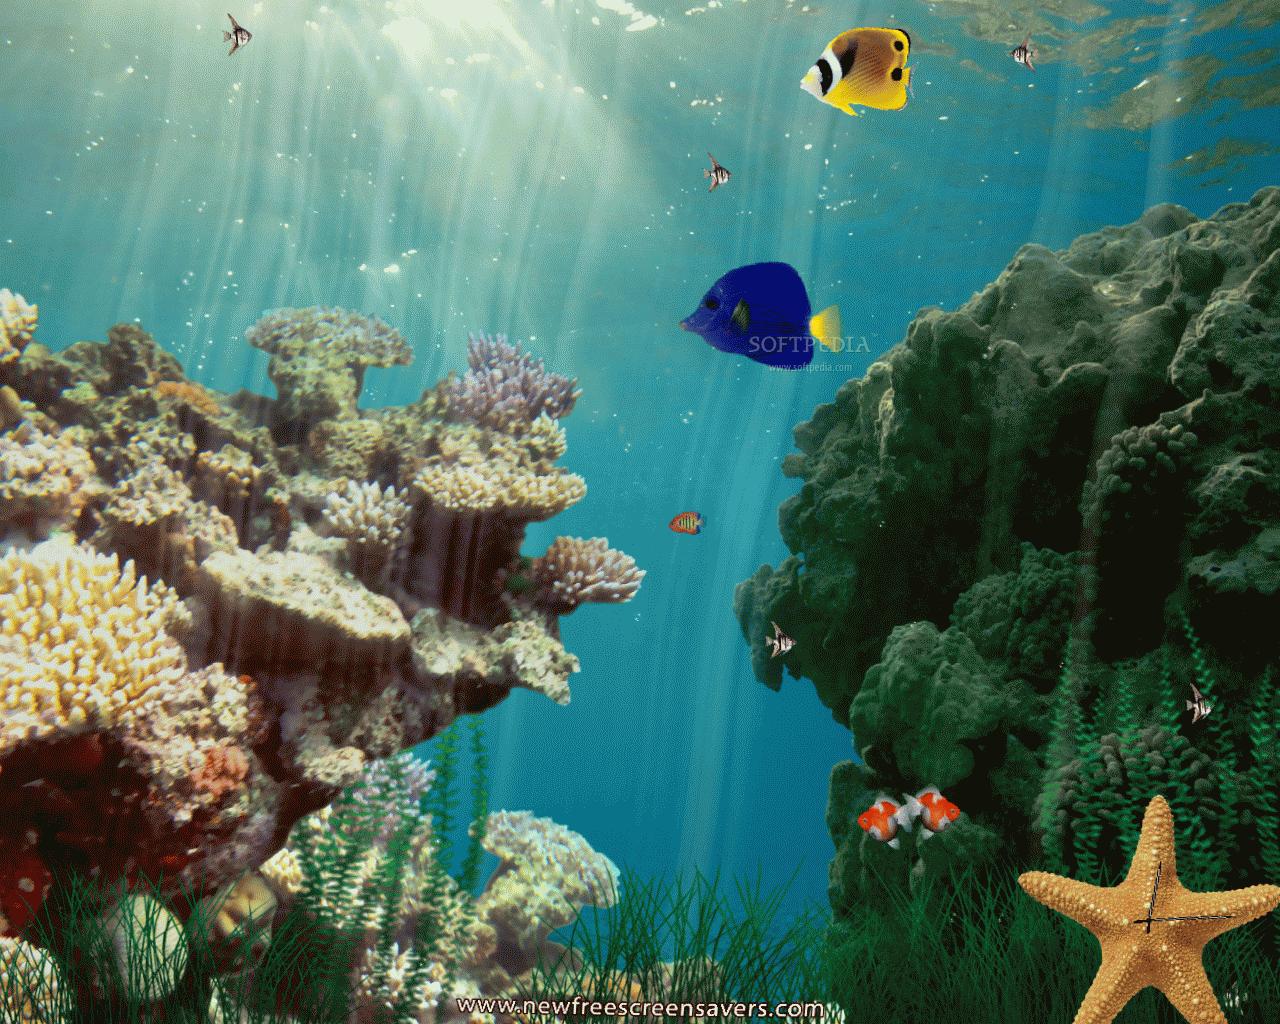 Animated Underwater Wallpaper - WallpaperSafari